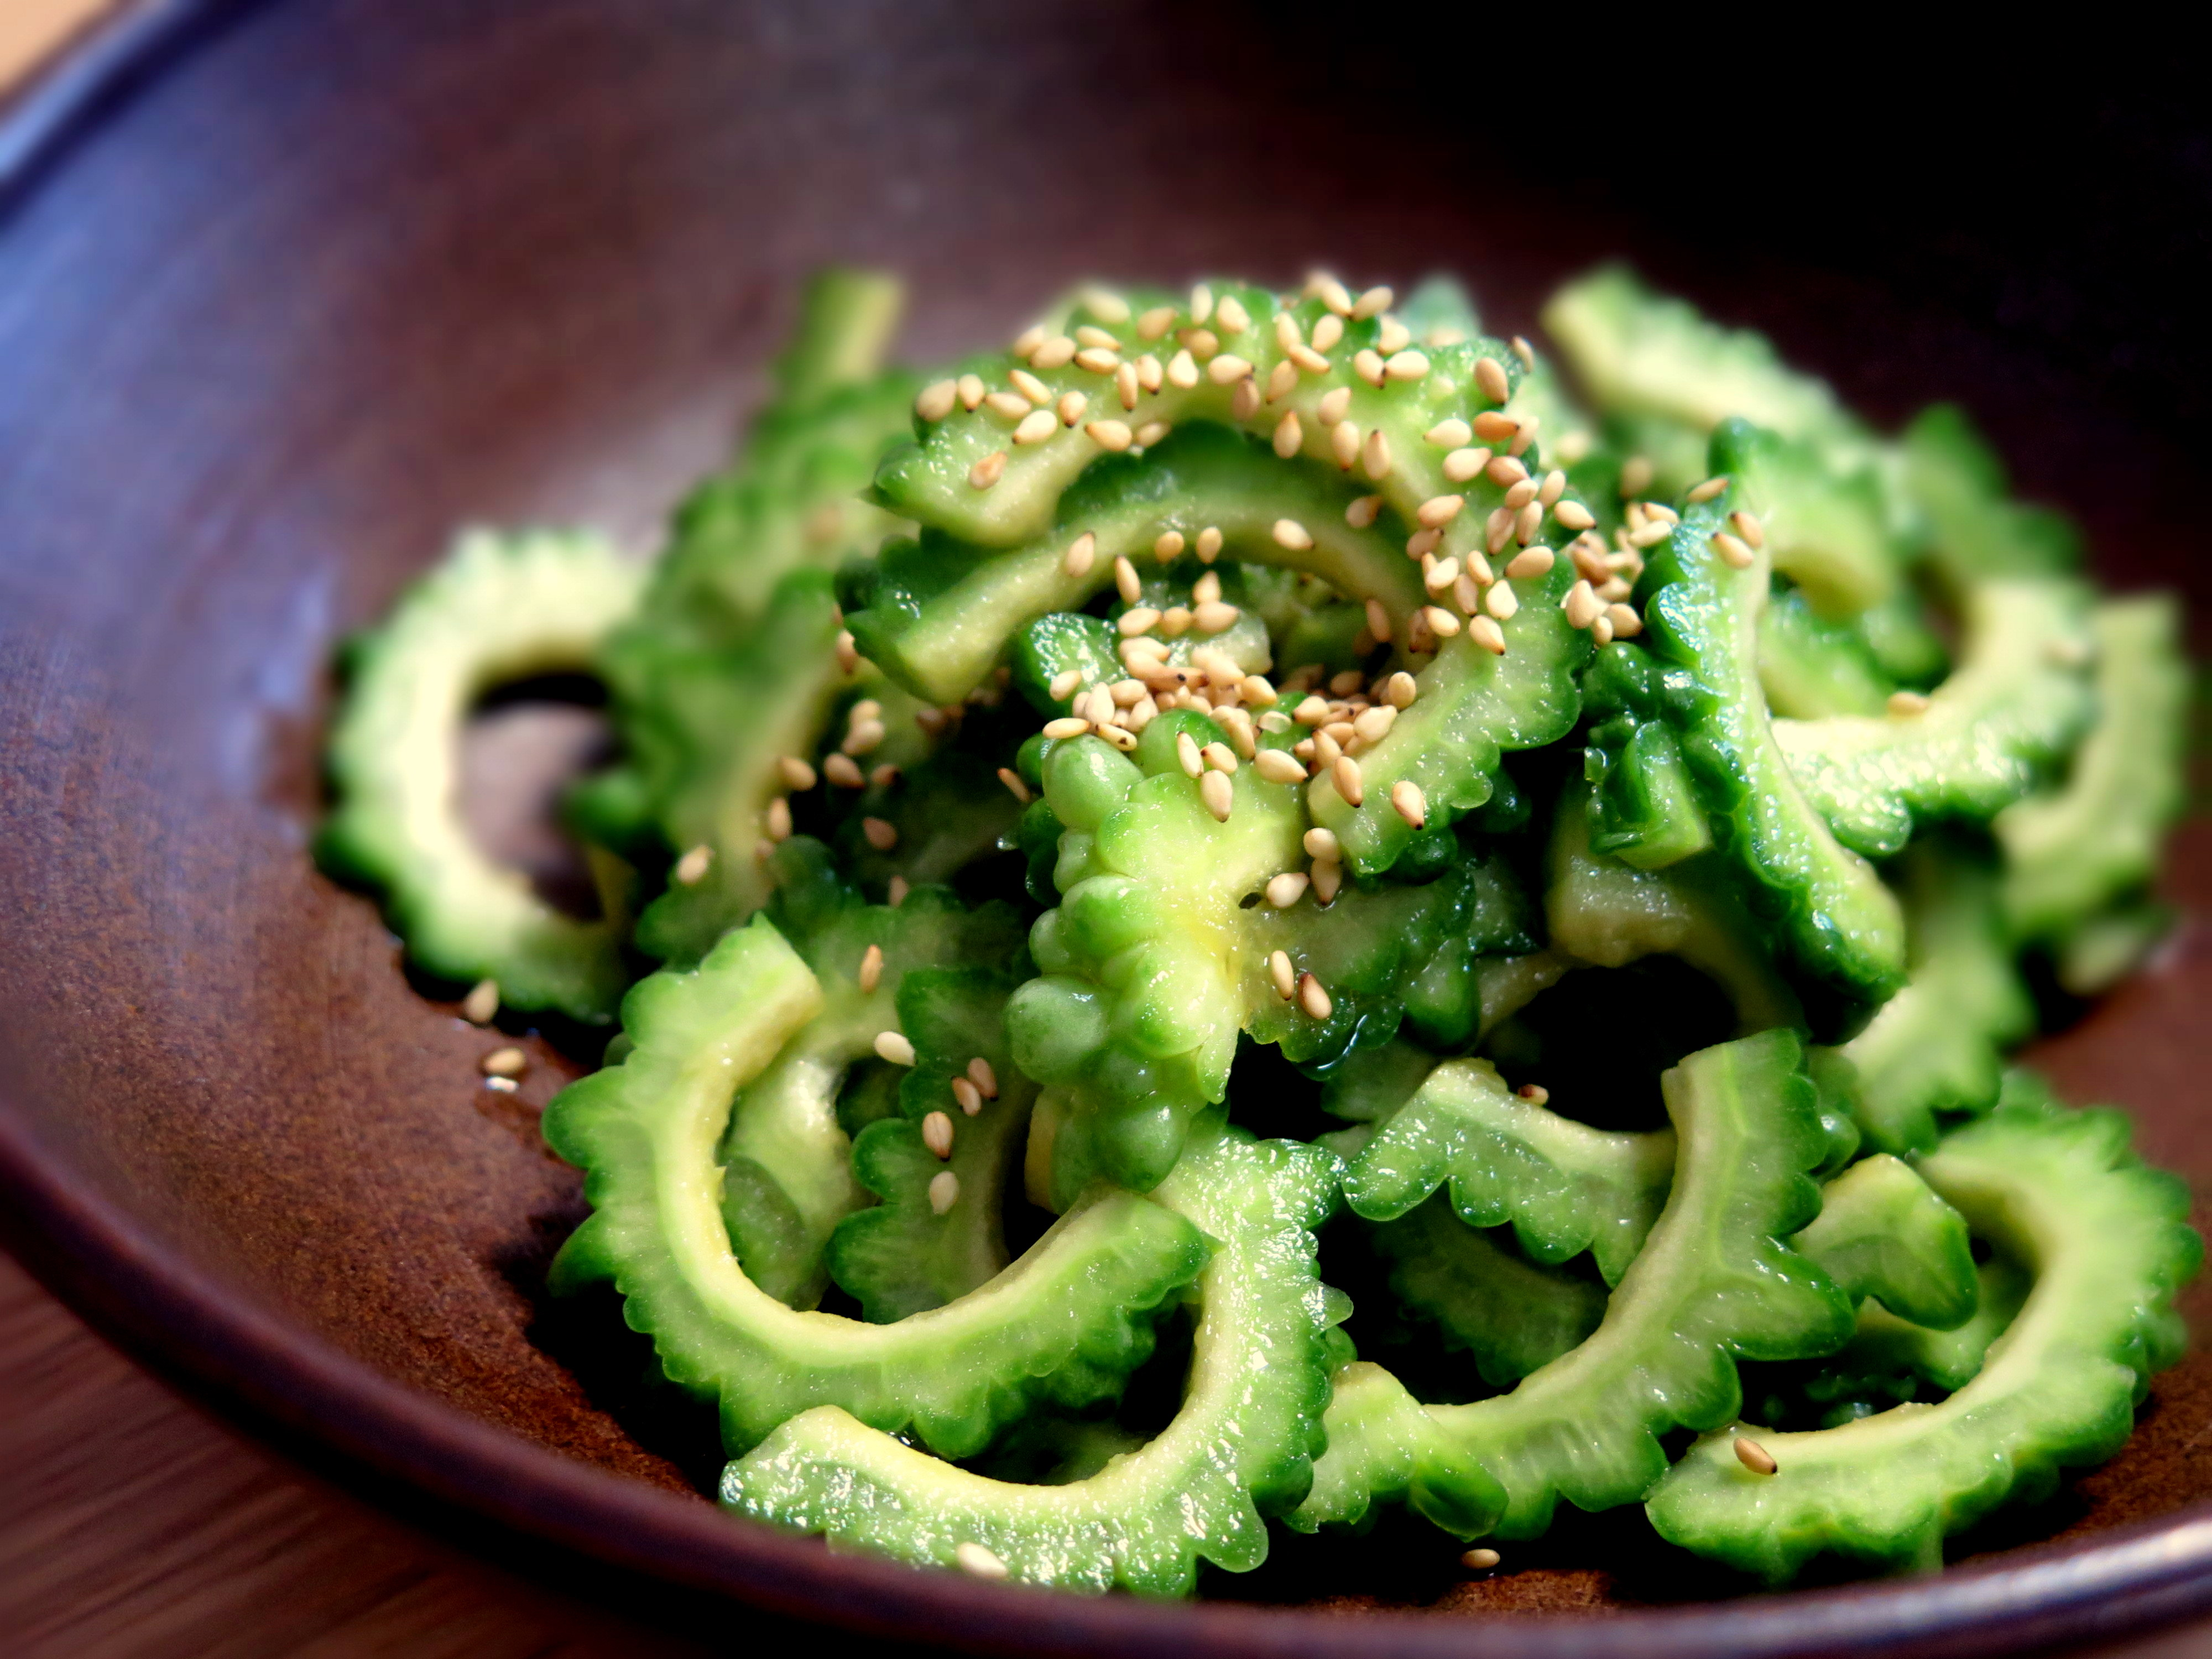 Top 10 weird Japanese food | TokyoTreat: Japanese Candy & Snacks